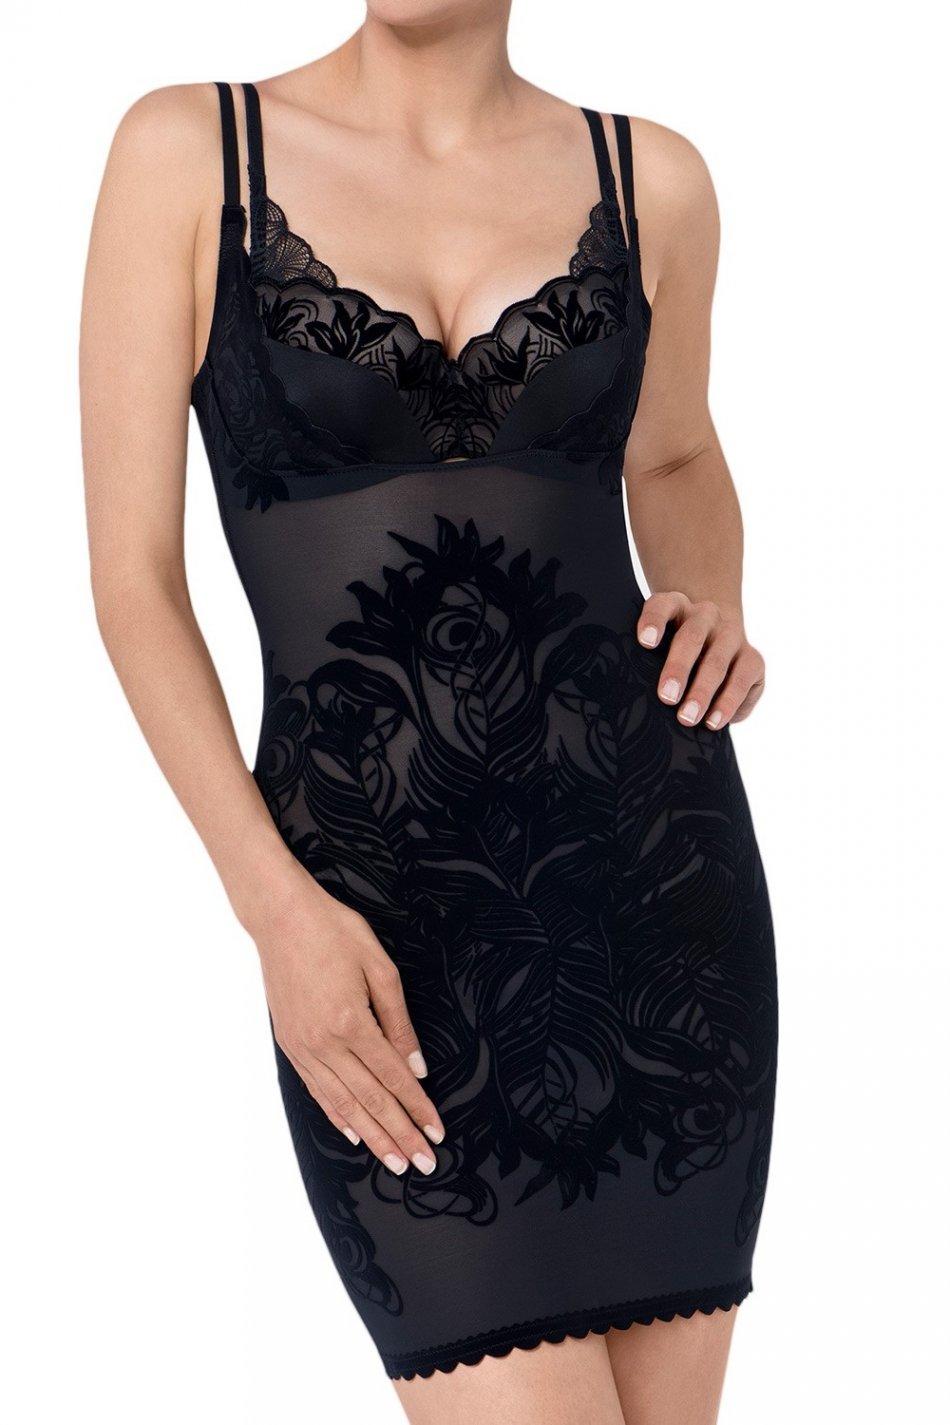 Lenjerie intima, Triumph Magic Boost Velvet Dress, Negru, XL